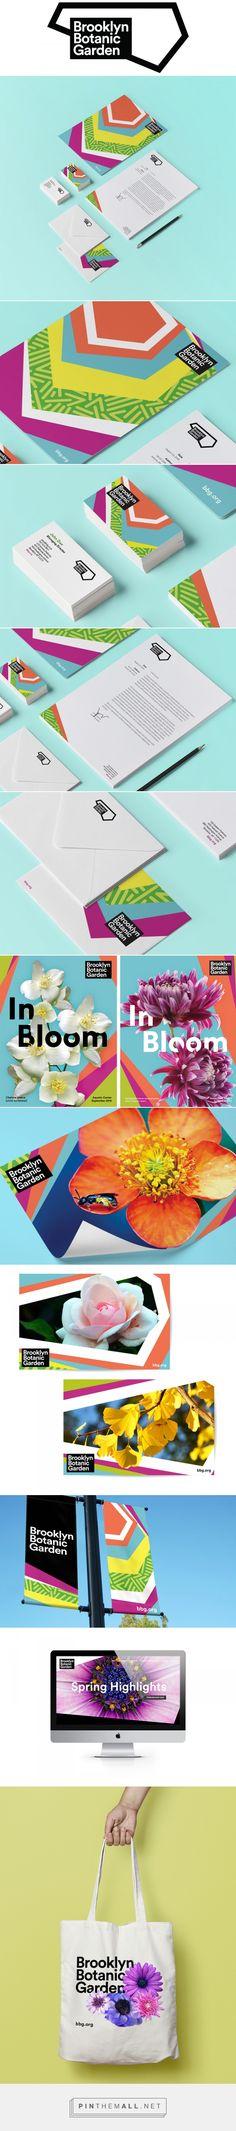 Brooklyn Botanic Garden on Behance | Fivestar Branding – Design and Branding Agency & Inspiration Gallery http://jrstudioweb.com/diseno-grafico/diseno-de-logotipos/